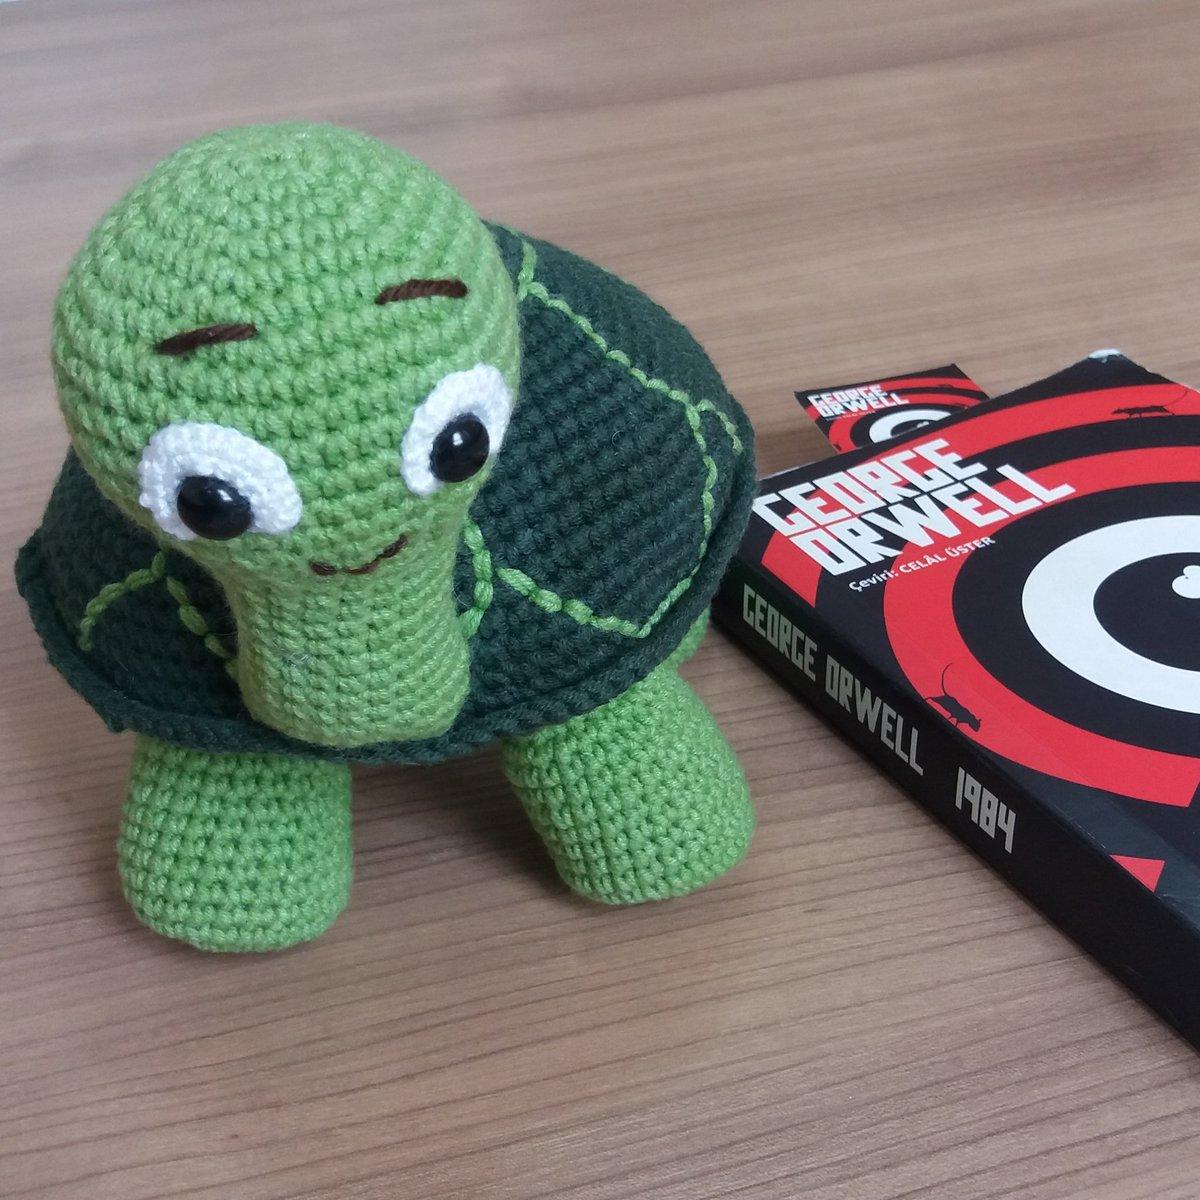 Amigurumi #Bebek #Crochet Crafts Disney #Niloya #Tariflerim ... | 1200x1200